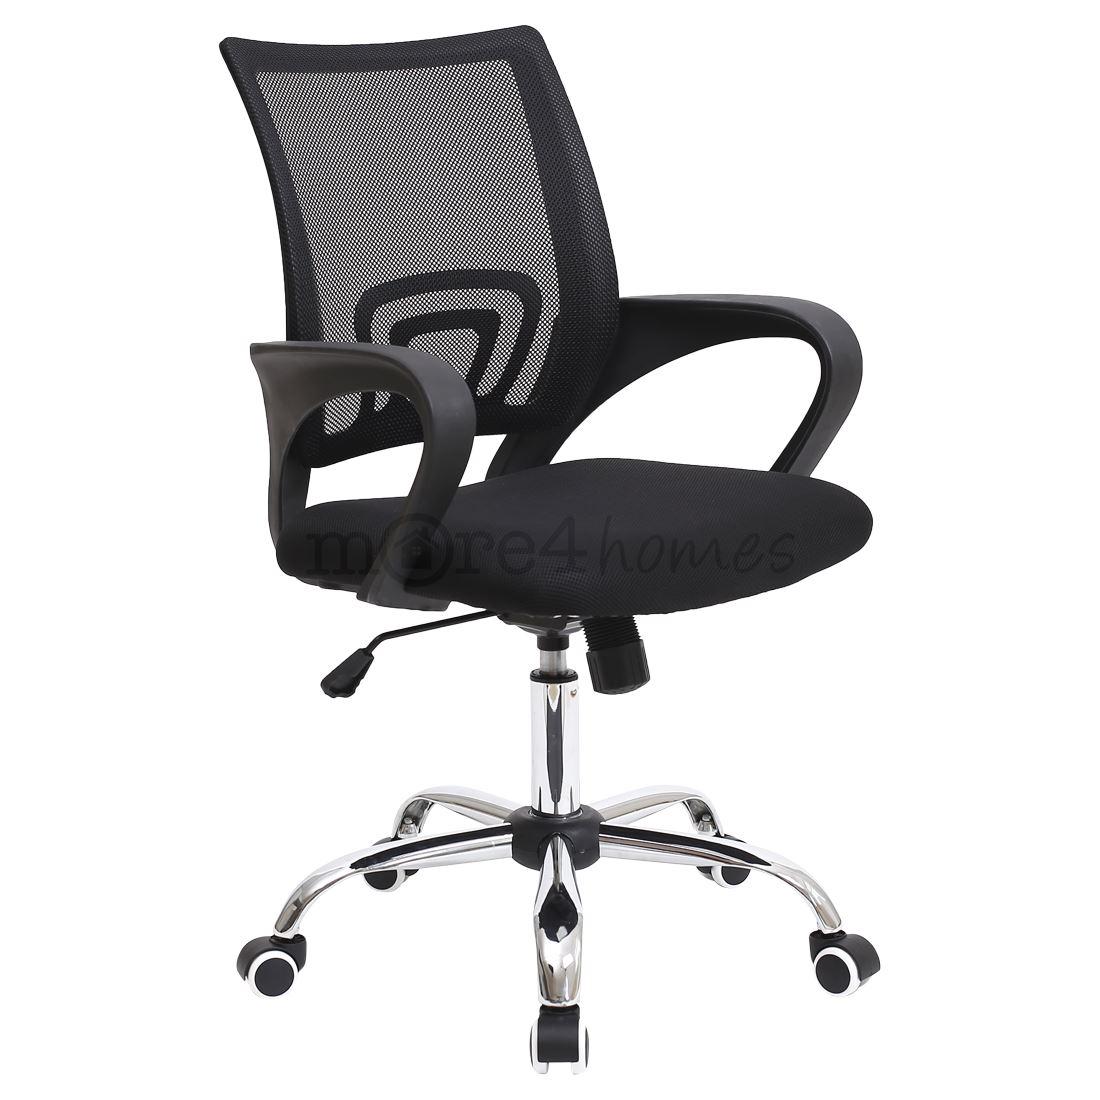 chair hr leather office high with mesh back headrest arlanda